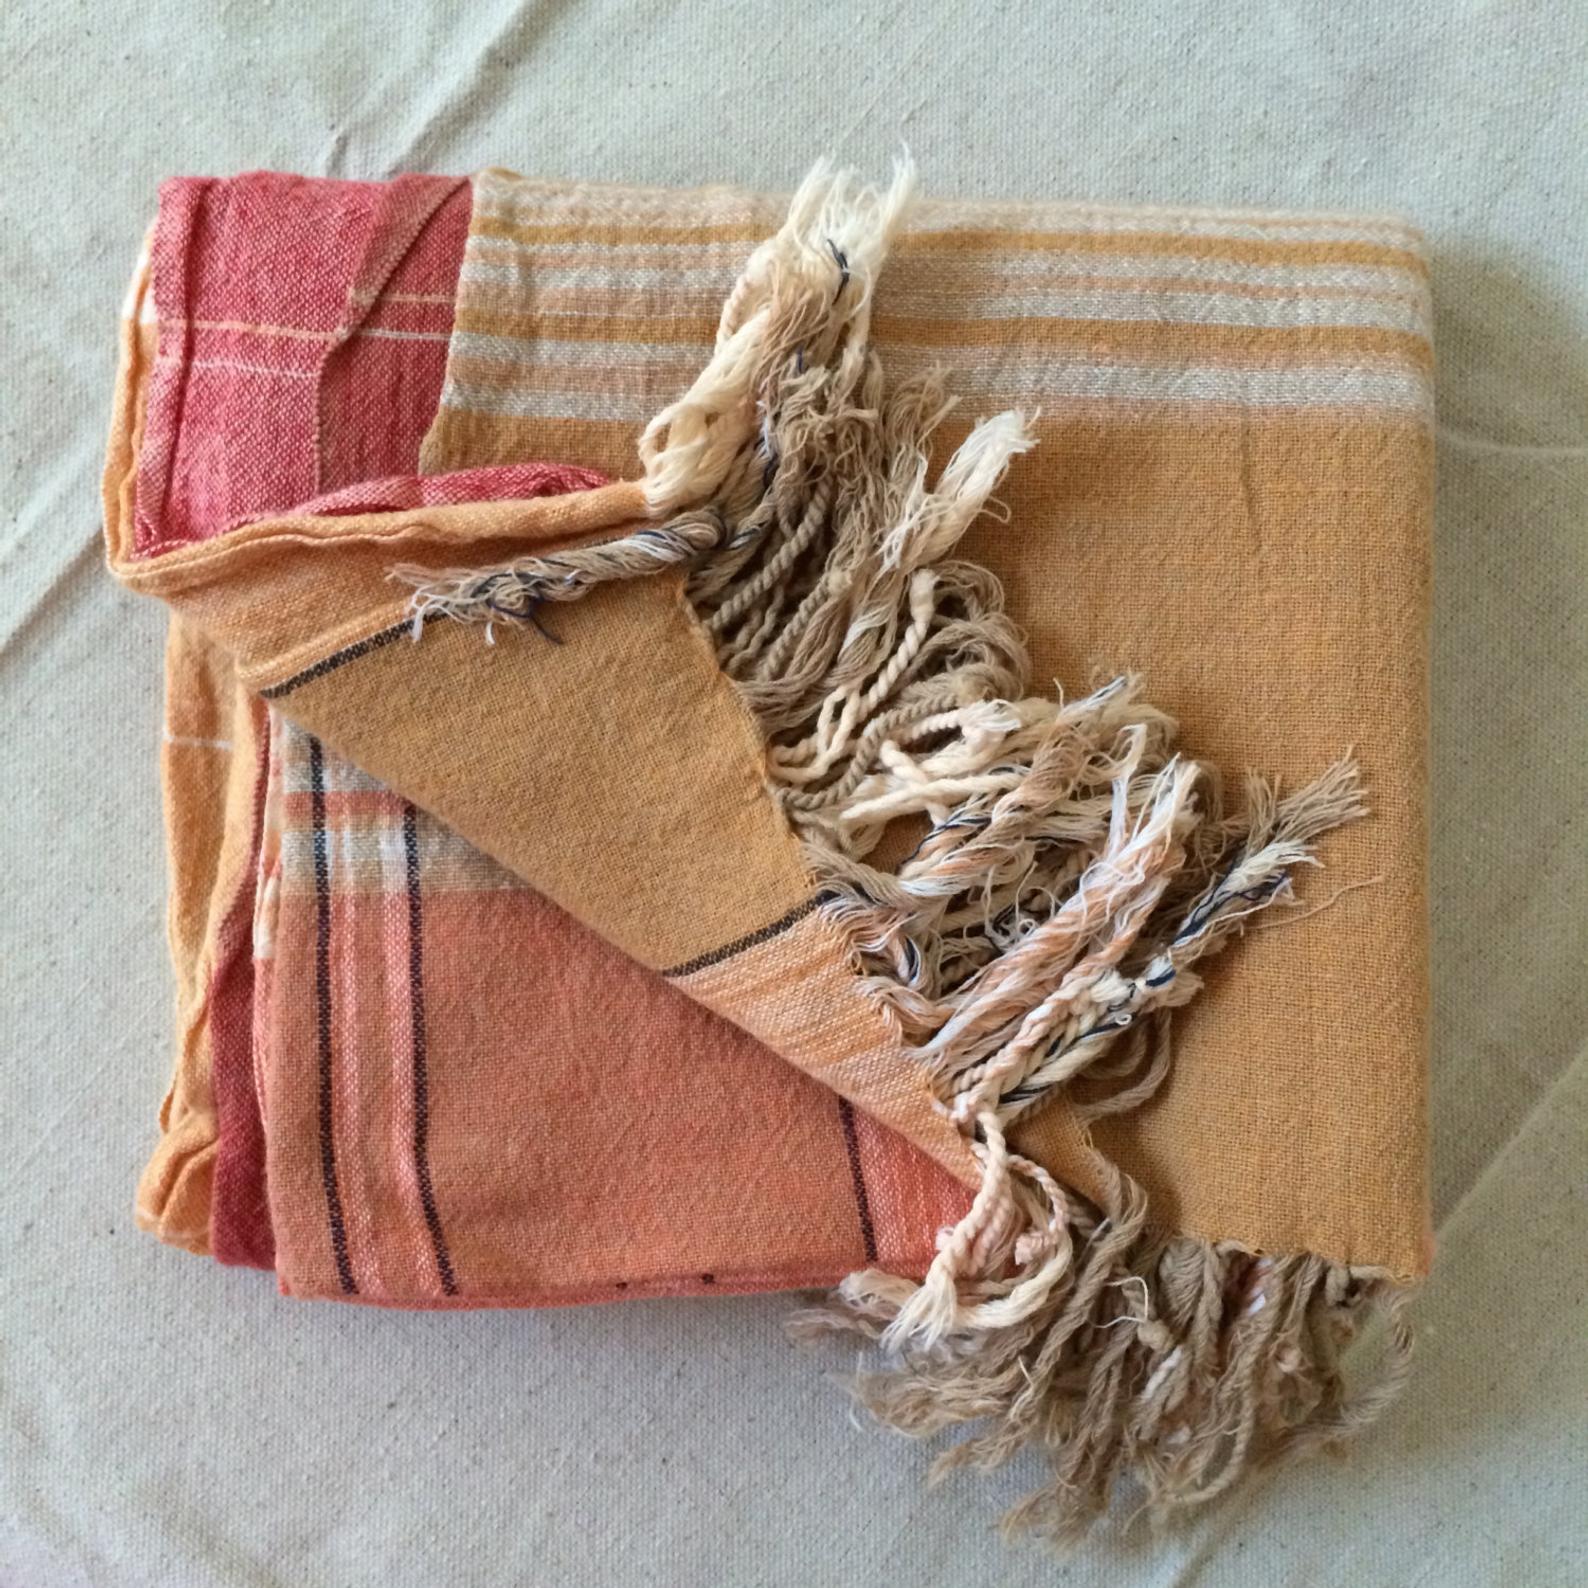 Fanny – Peach _ Orange Striped Beach or Picnic Blanket